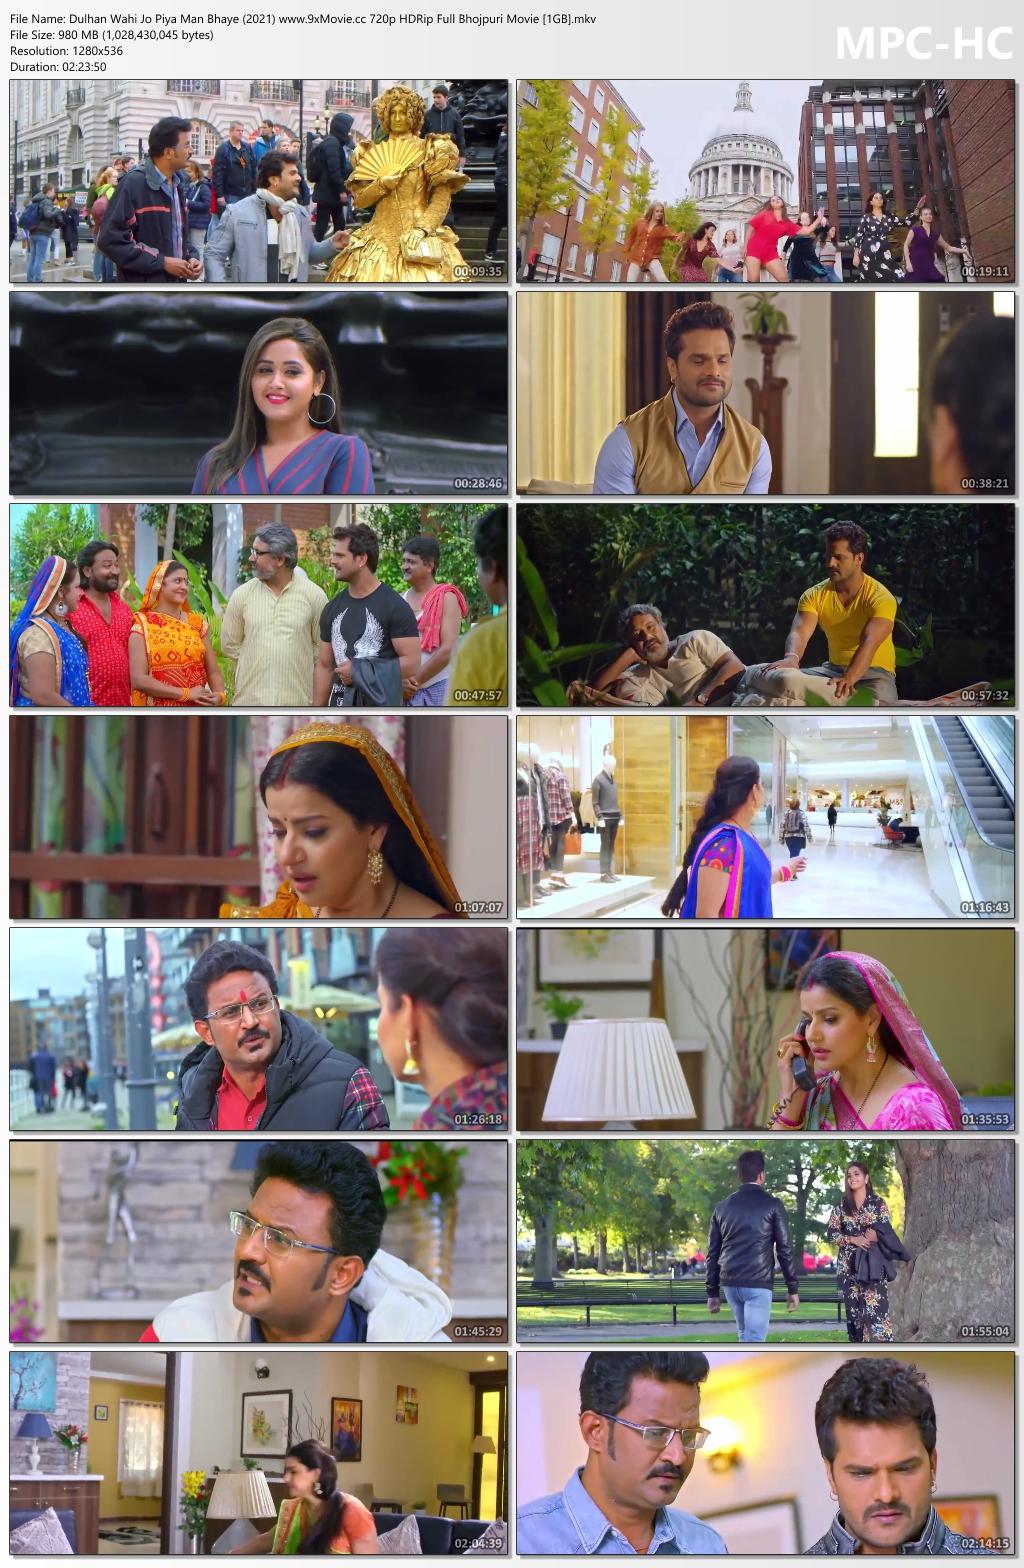 Dulhan-Wahi-Jo-Piya-Man-Bhaye-2021-www-9x-Movie-cc-720p-HDRip-Full-Bhojpuri-Movie-1-GB-mkv